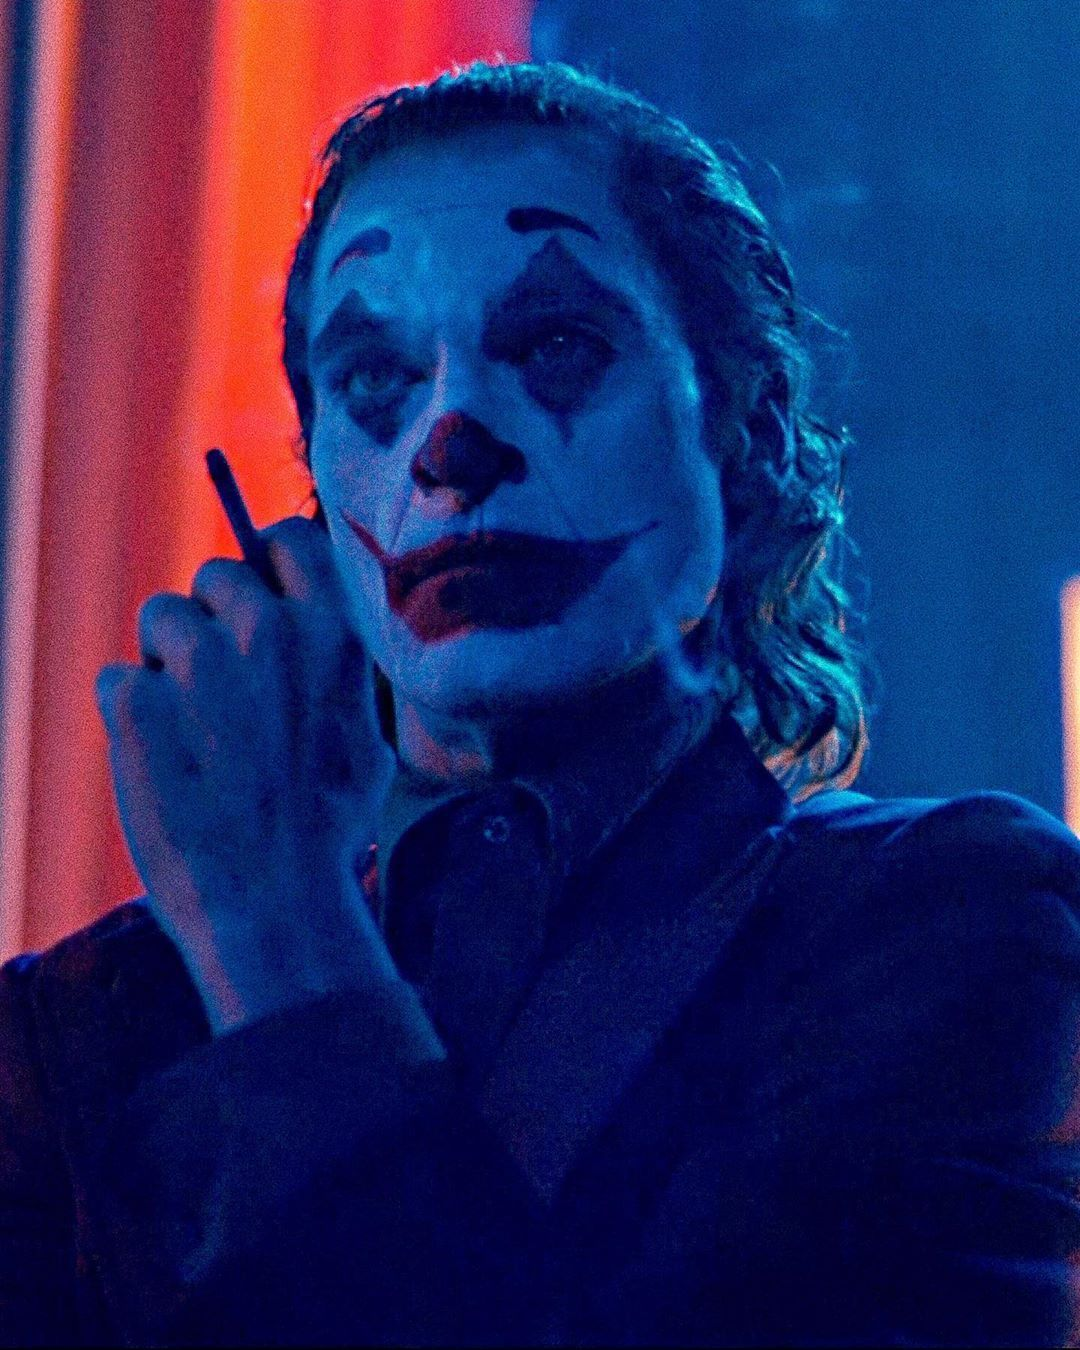 Pin On Joker Wallpaper